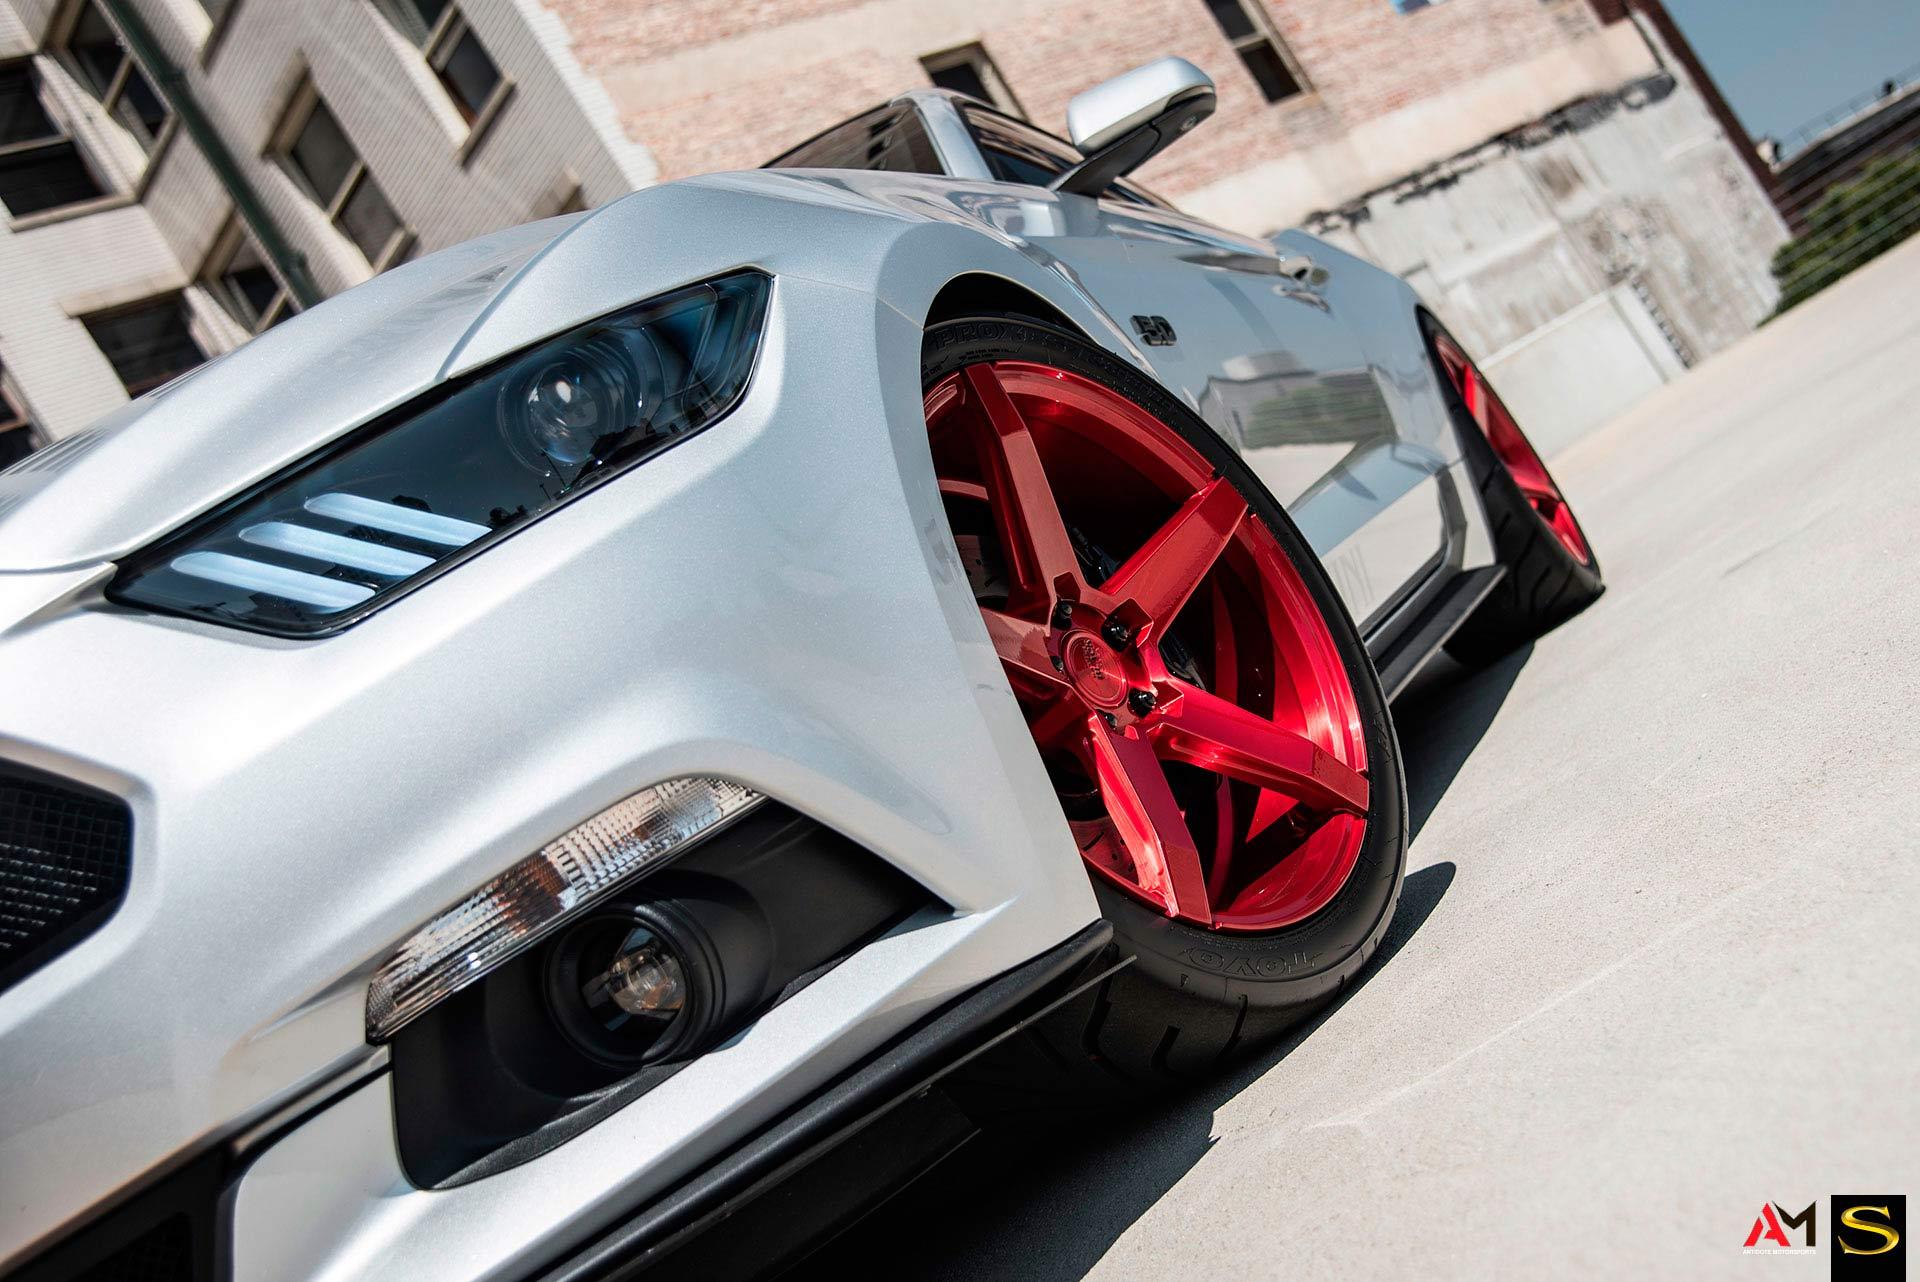 savini-wheels-black-di-forza-bm11-brushed-red-ford-mustang-gt-3